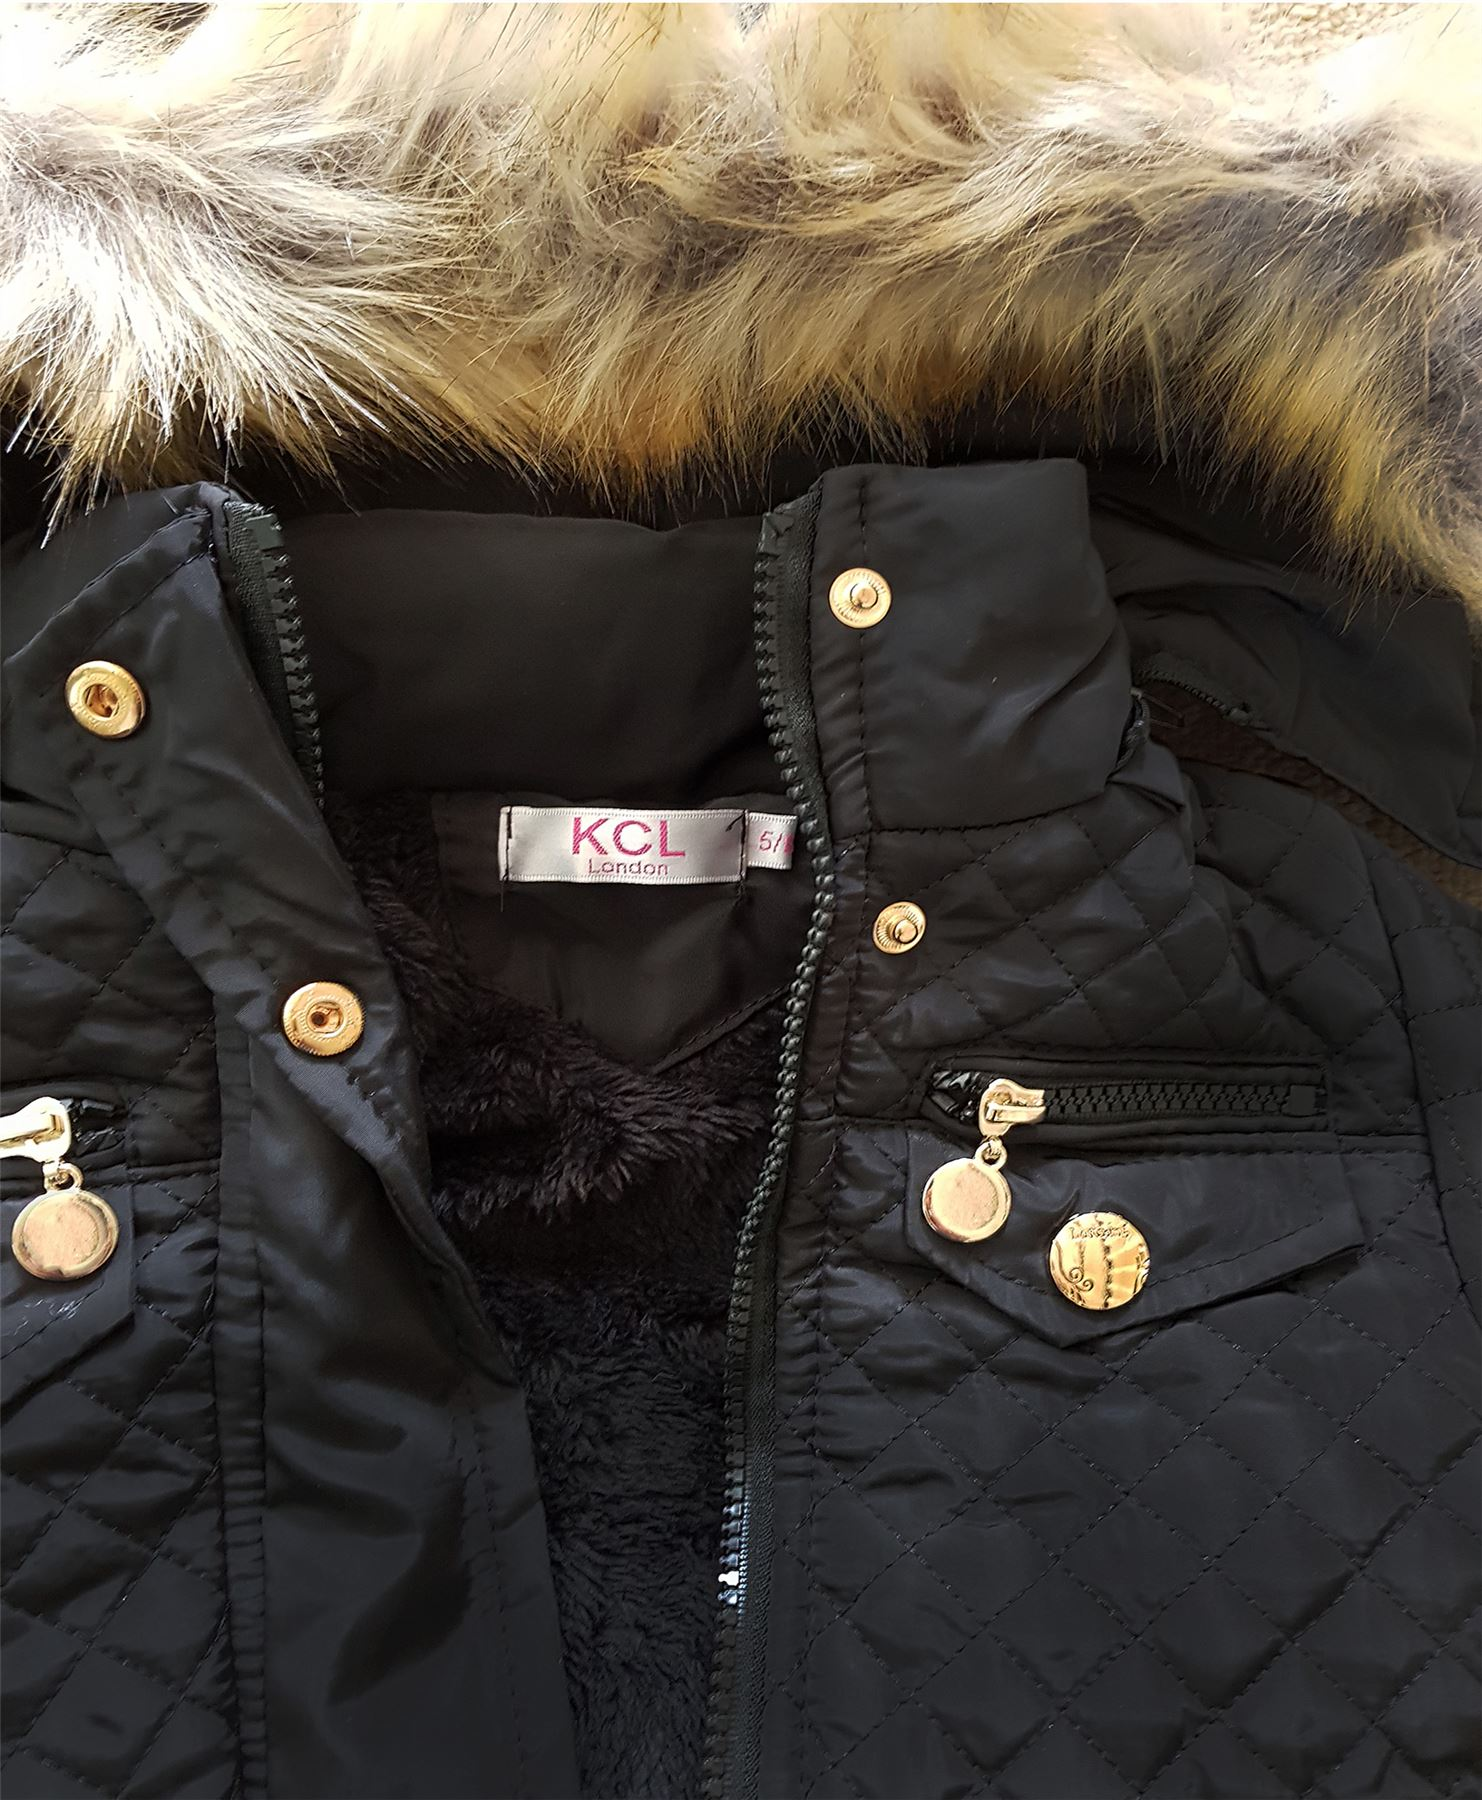 d39dcb682 Girls Quilted Winter Coat Kids Fur Lining Detach Hood Padded Jacket ...